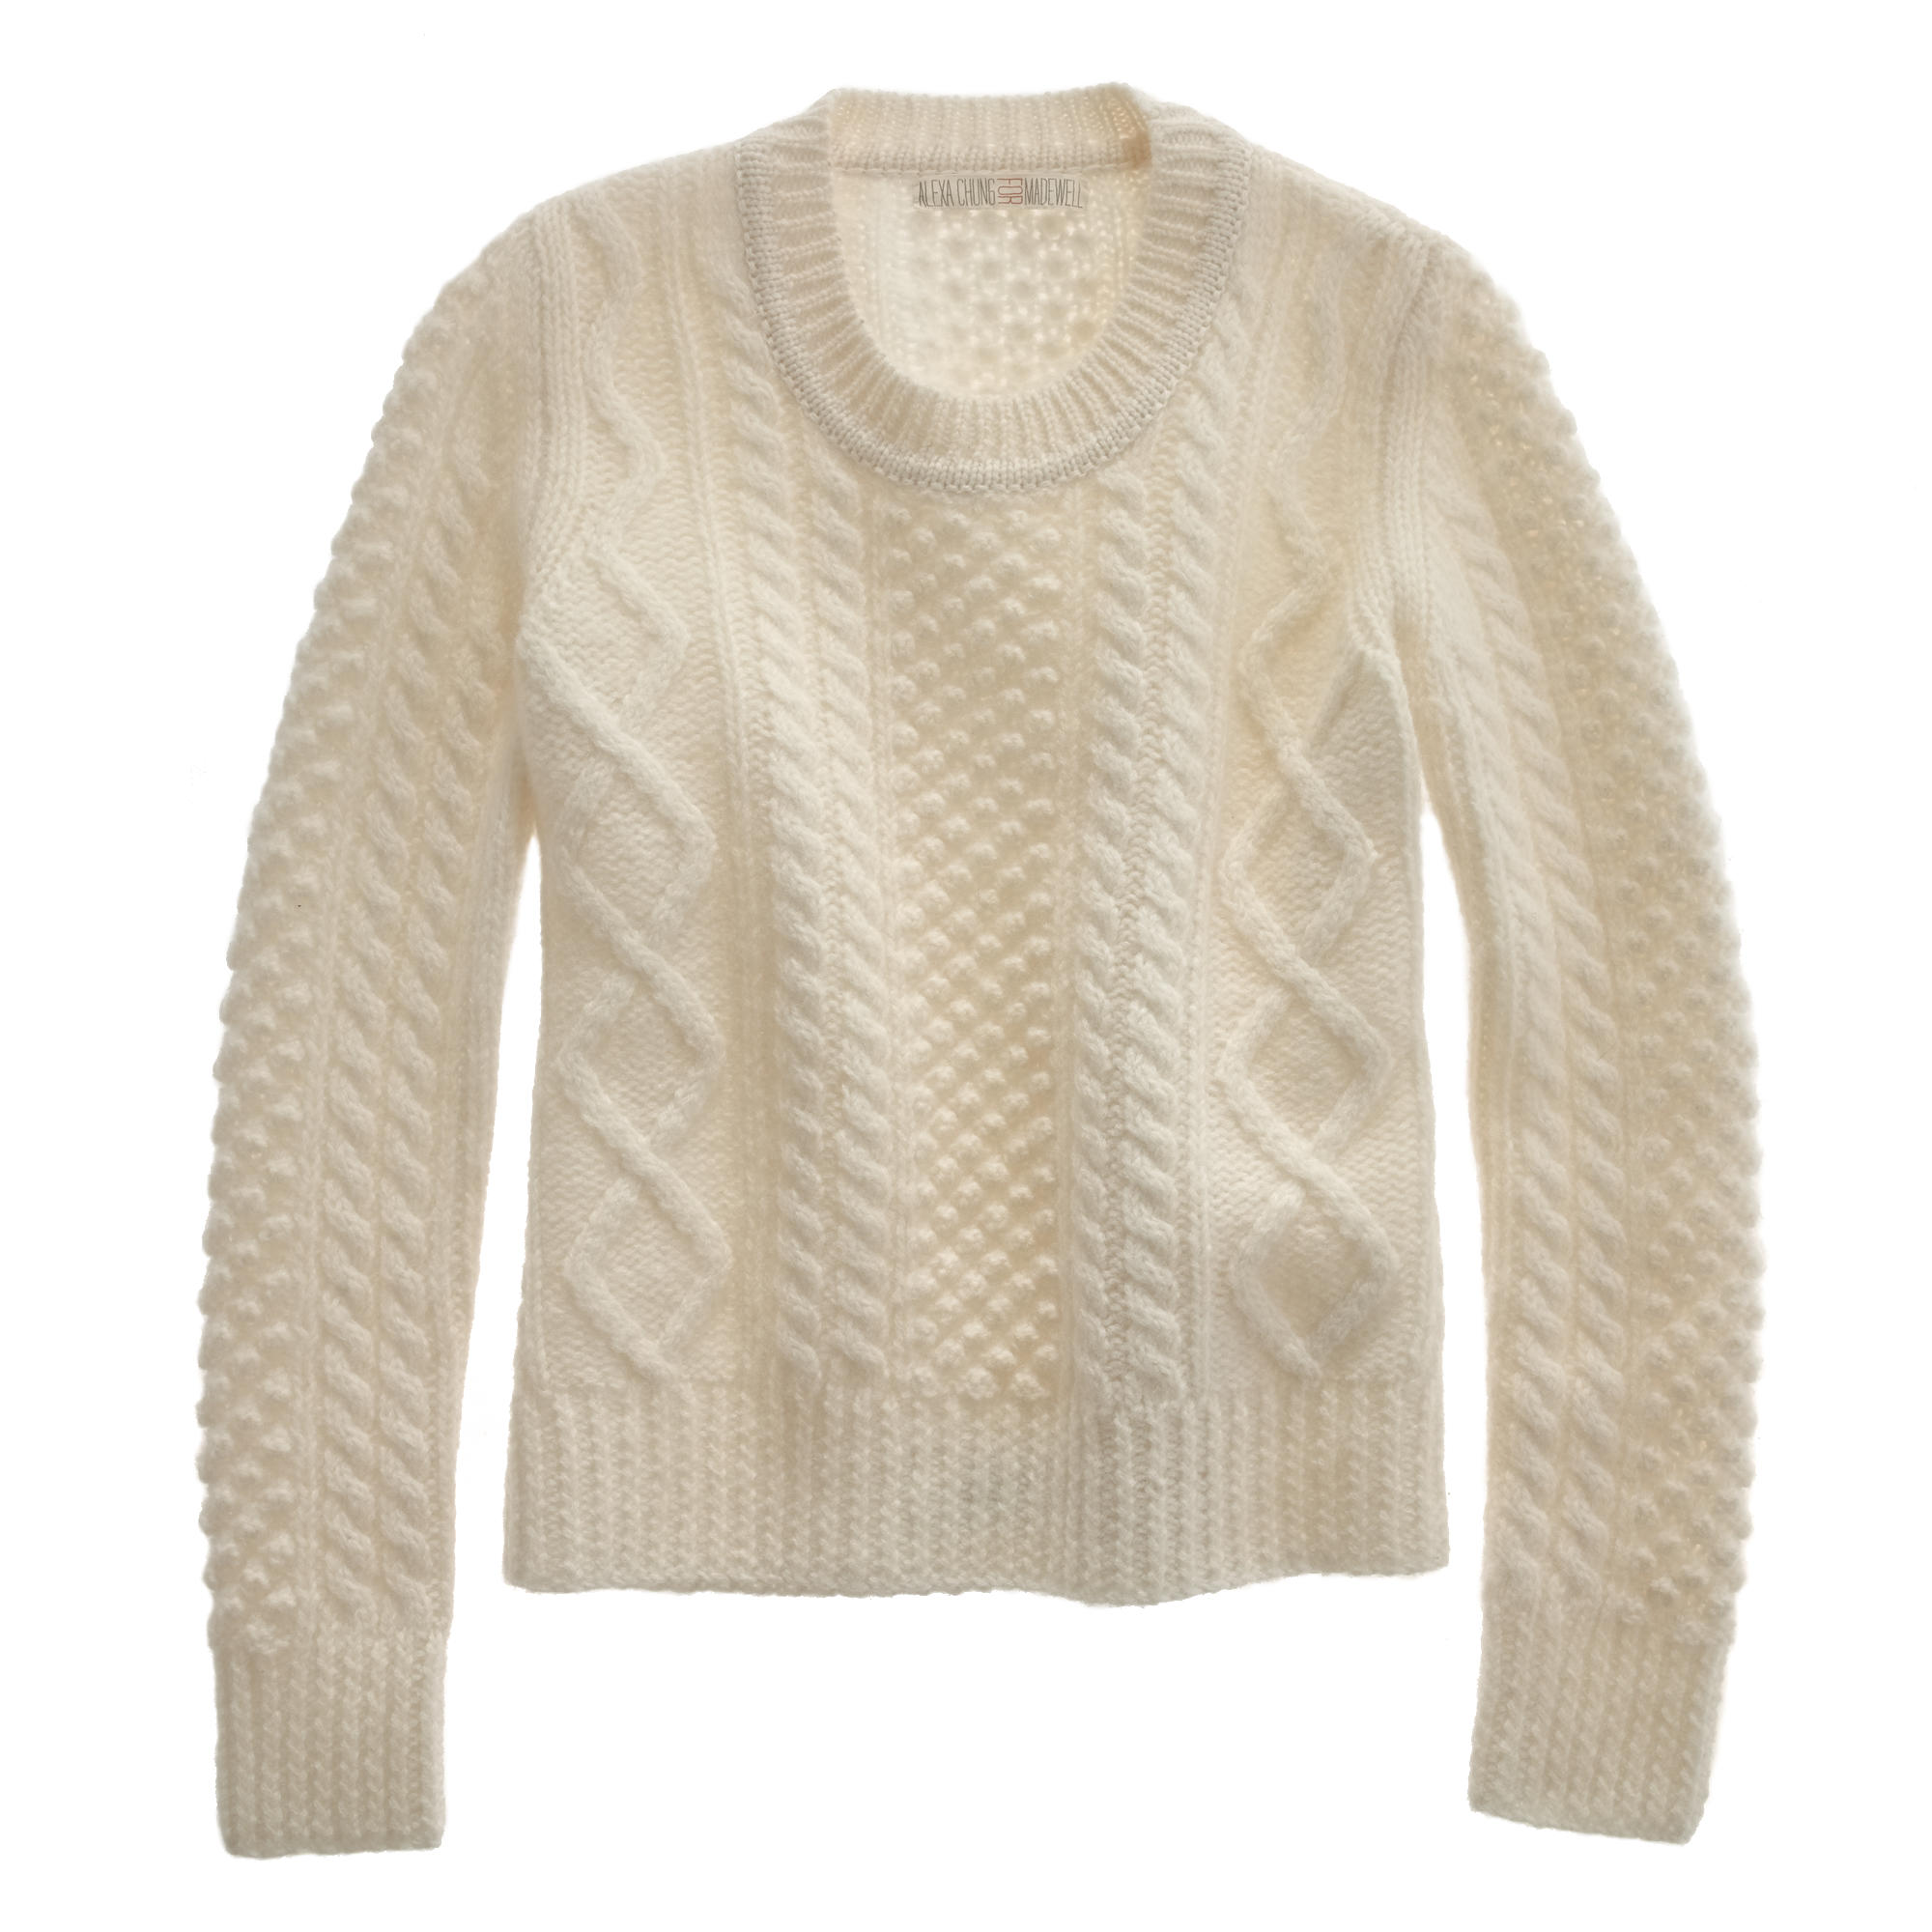 Alexa Chung for Madewell Aimee Fisherman-Knit Sweater ...